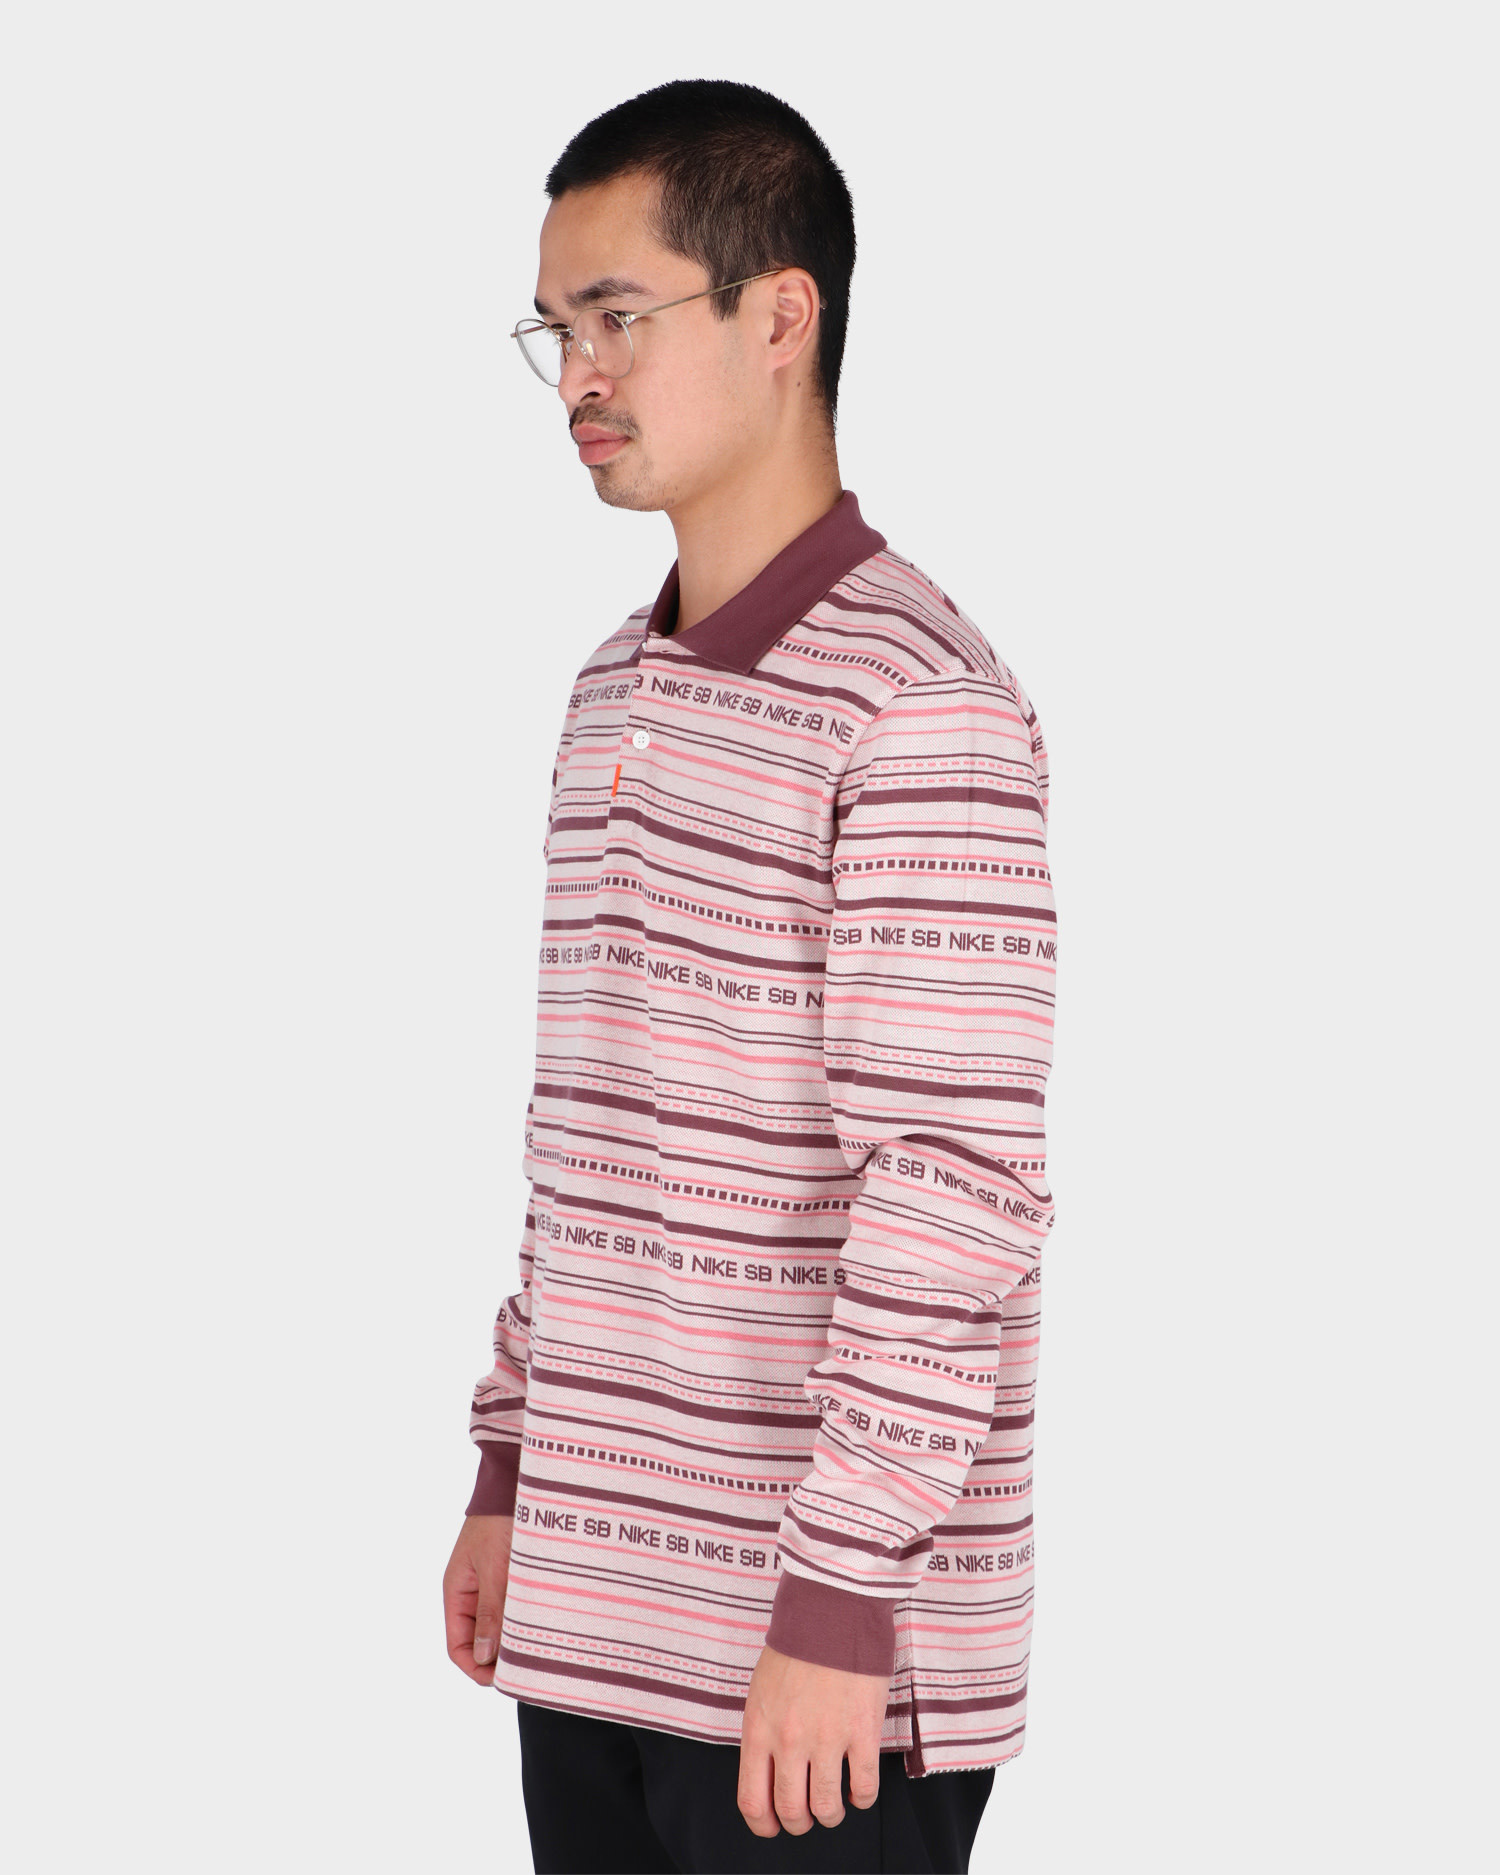 Nike SB Polo Pink Oxford/Dark Wine/Pink Salt